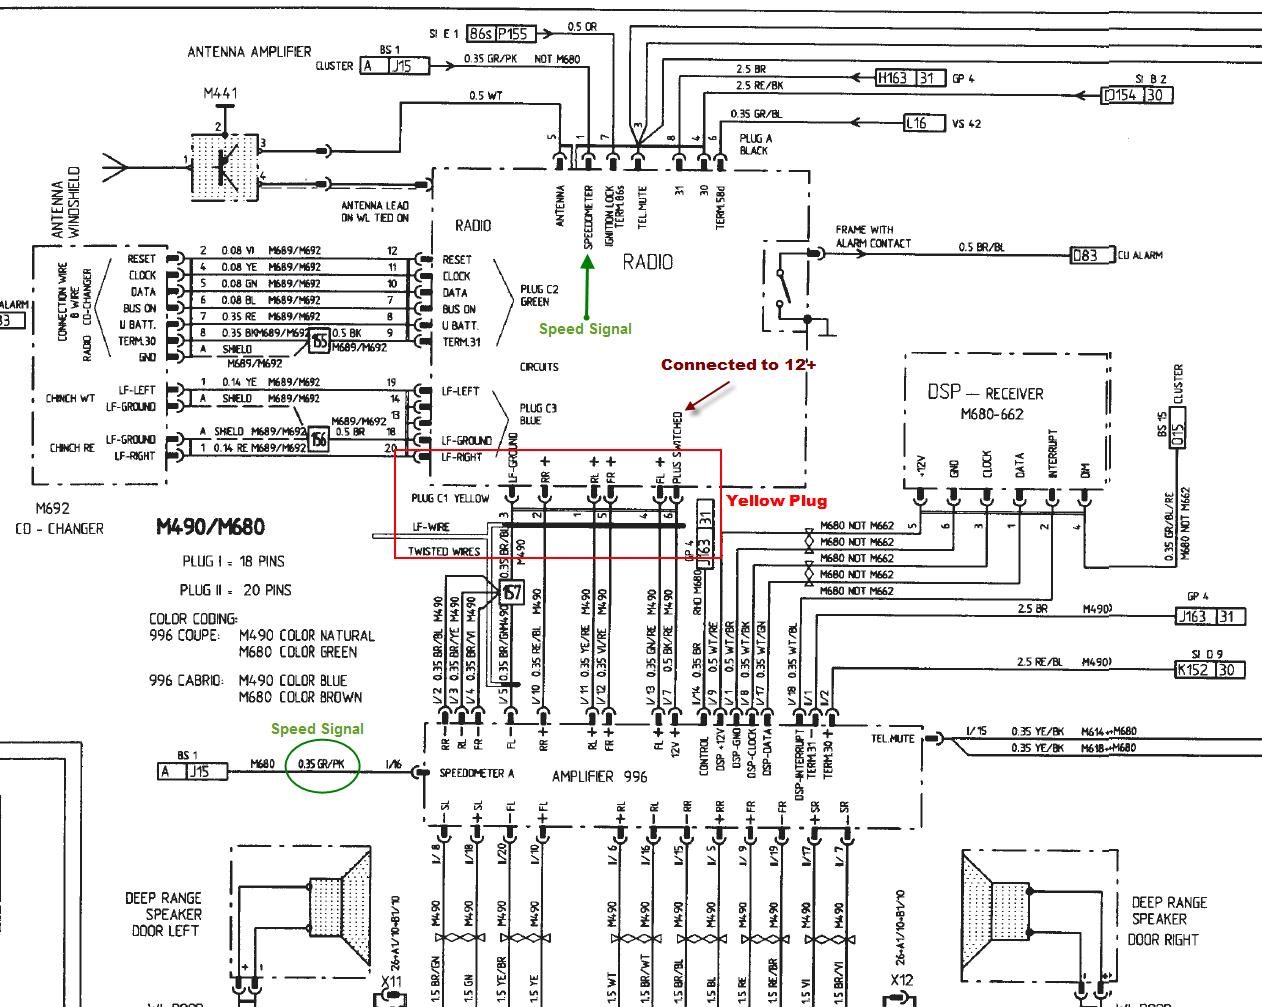 80 radiowiring_5a64549eac81f27f3f250d4ad01b4bb18b4d62d3?resize\\\=665%2C531\\\&ssl\\\=1 diagrams 10661522 land rover ries 2a wiring diagrams land rover land rover series 2a wiring diagram at soozxer.org